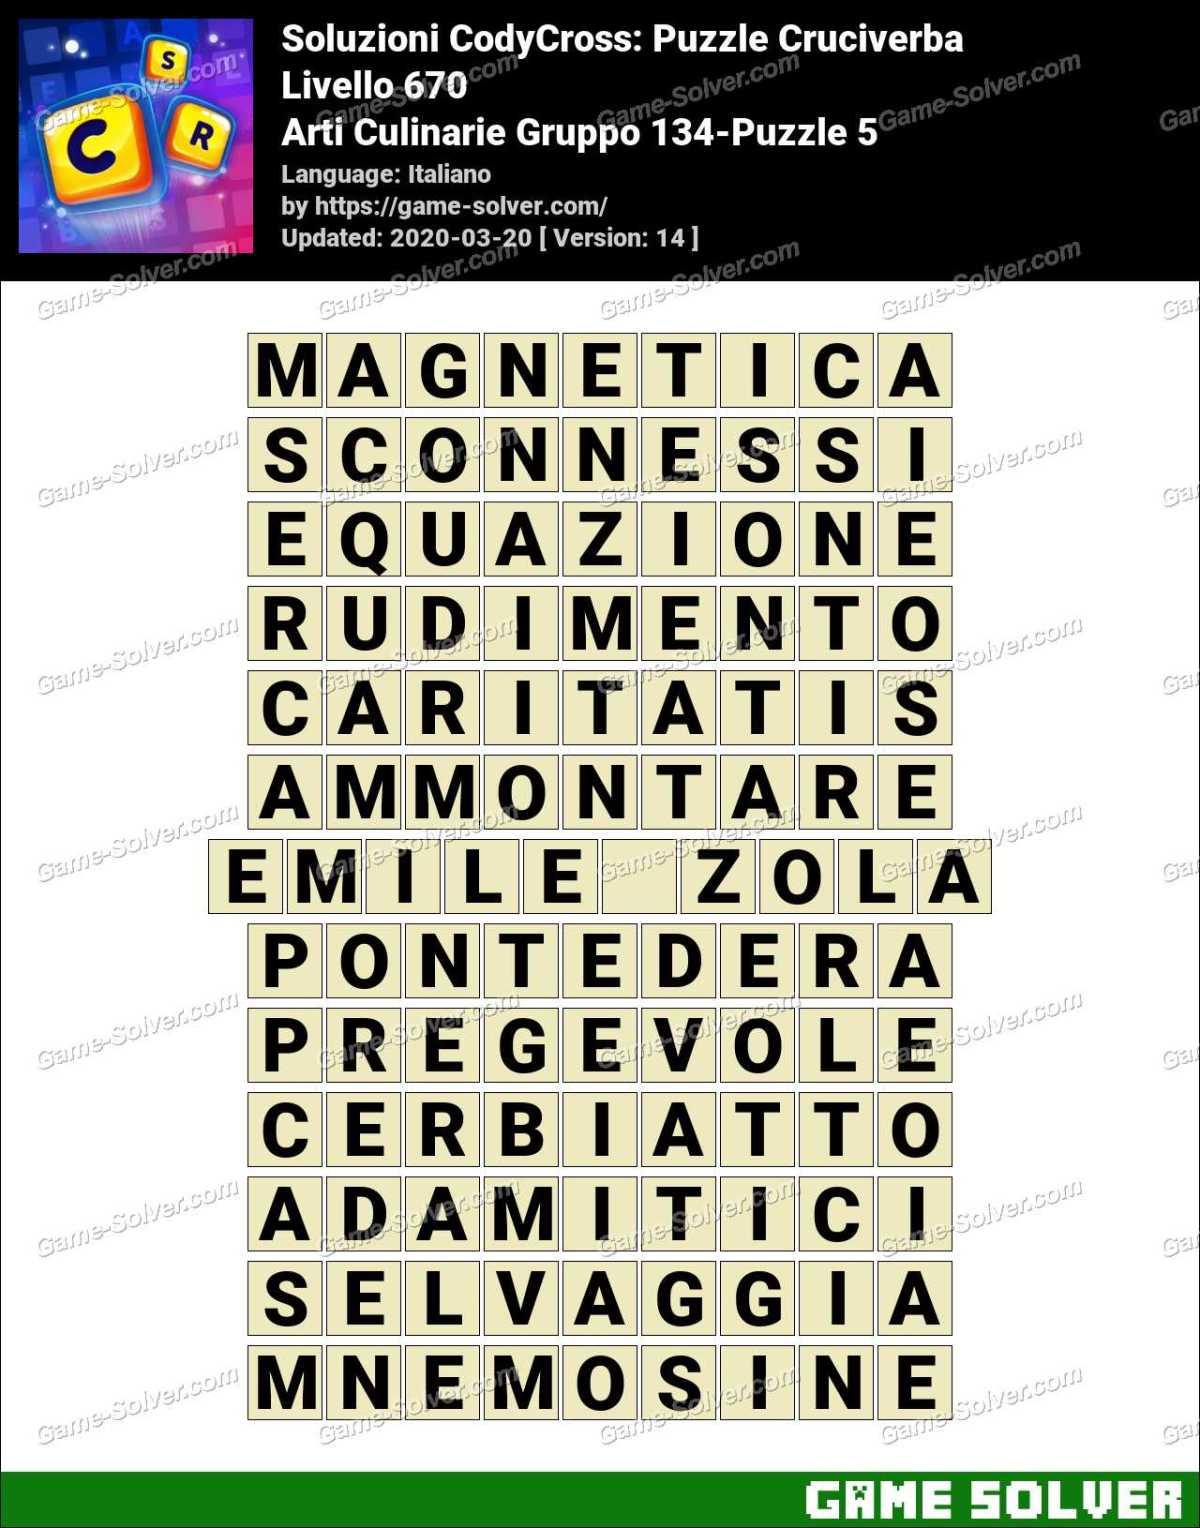 Soluzioni CodyCross Arti Culinarie Gruppo 134-Puzzle 5